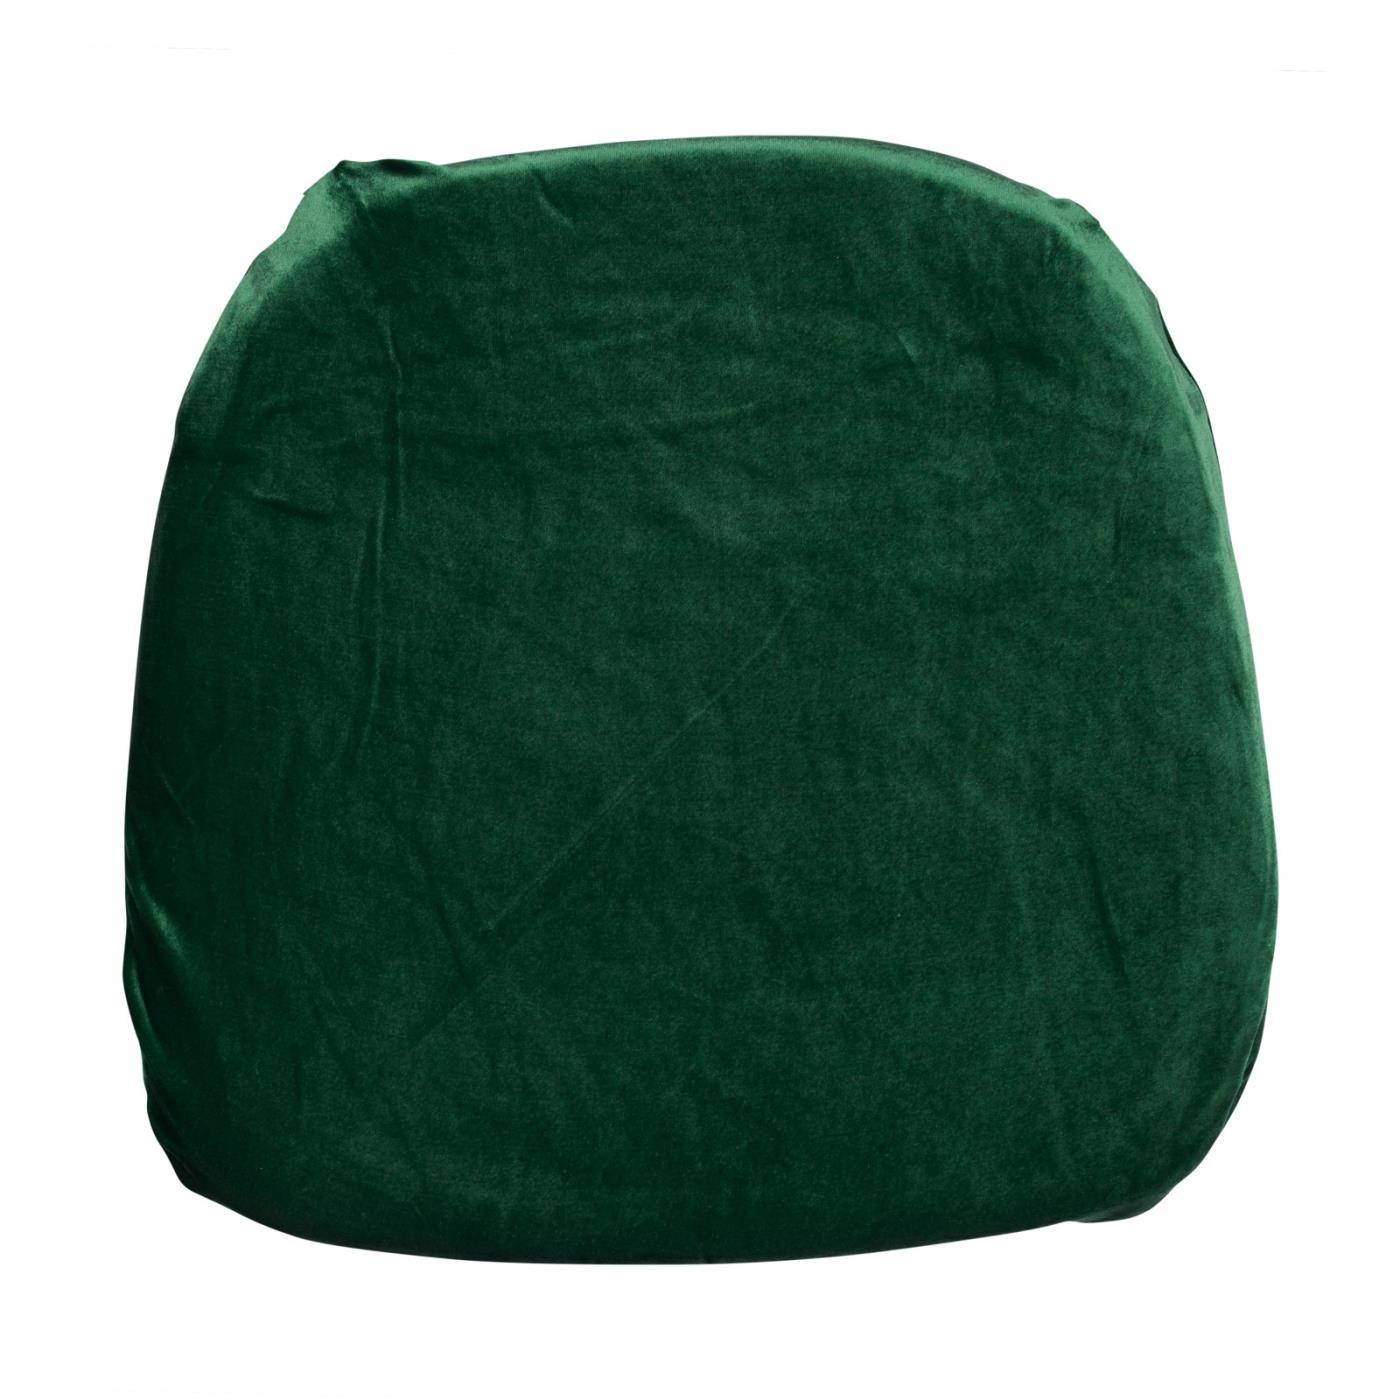 Velvet Seat Cushion For Rent Nyc Sdpr Nyc Nj